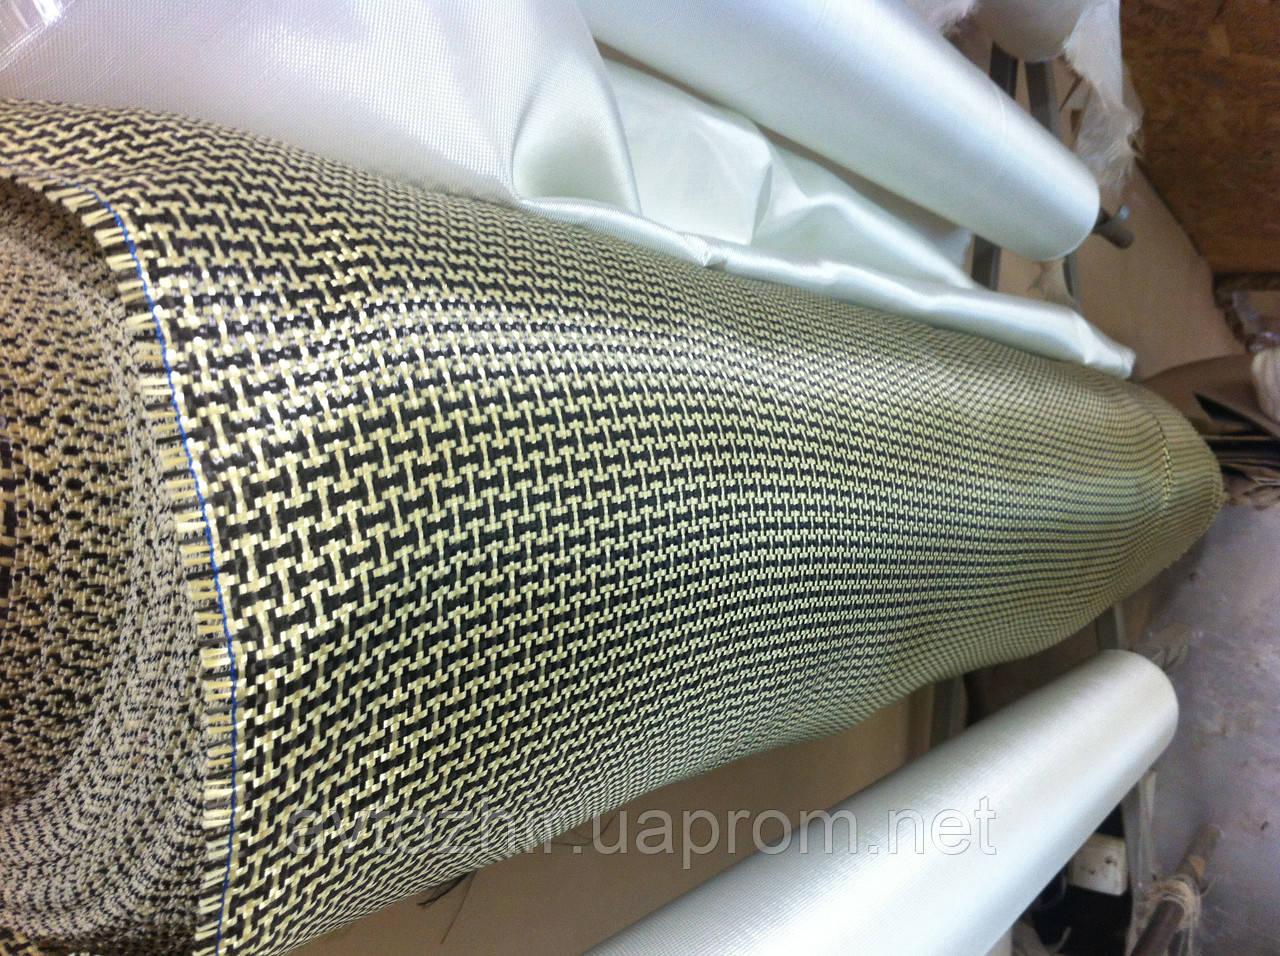 Ткань кевлар-карбон 165g/m2 płótno szer 120